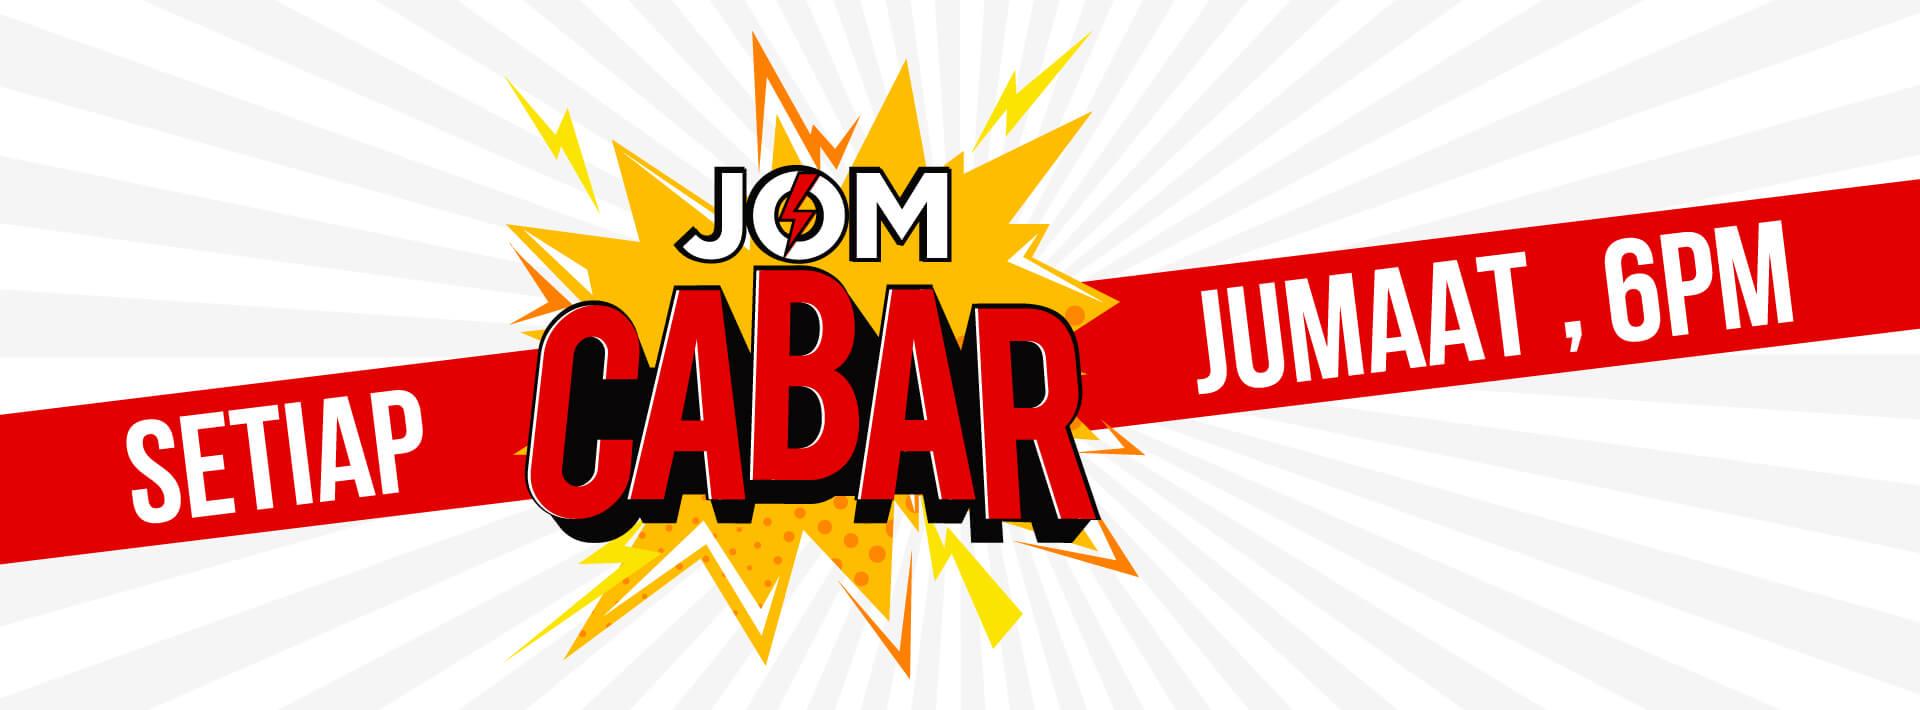 Jom Cabar